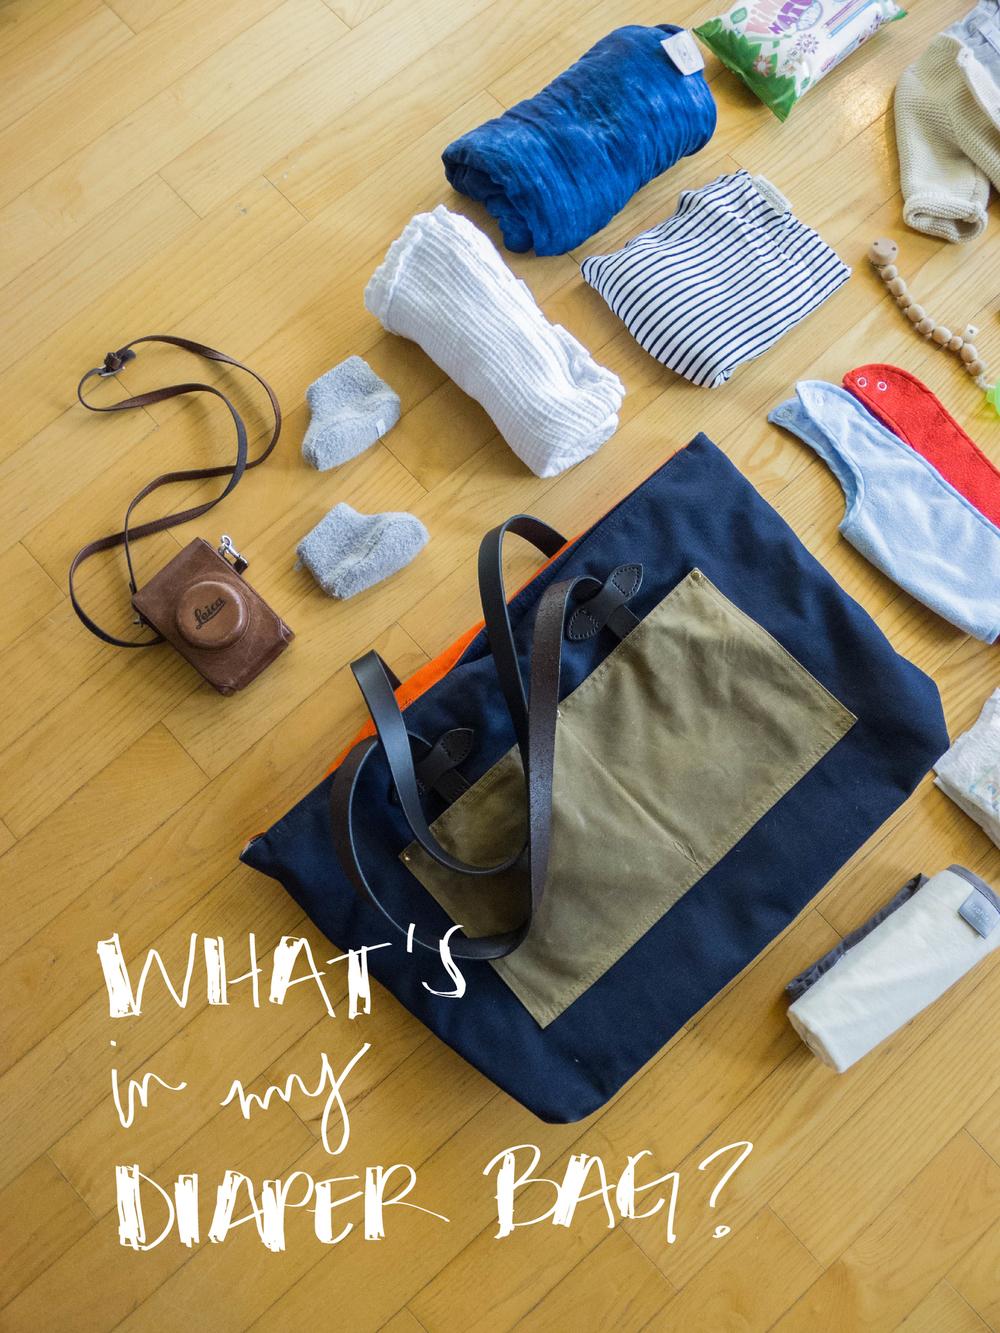 What's in my Diaper Bag?